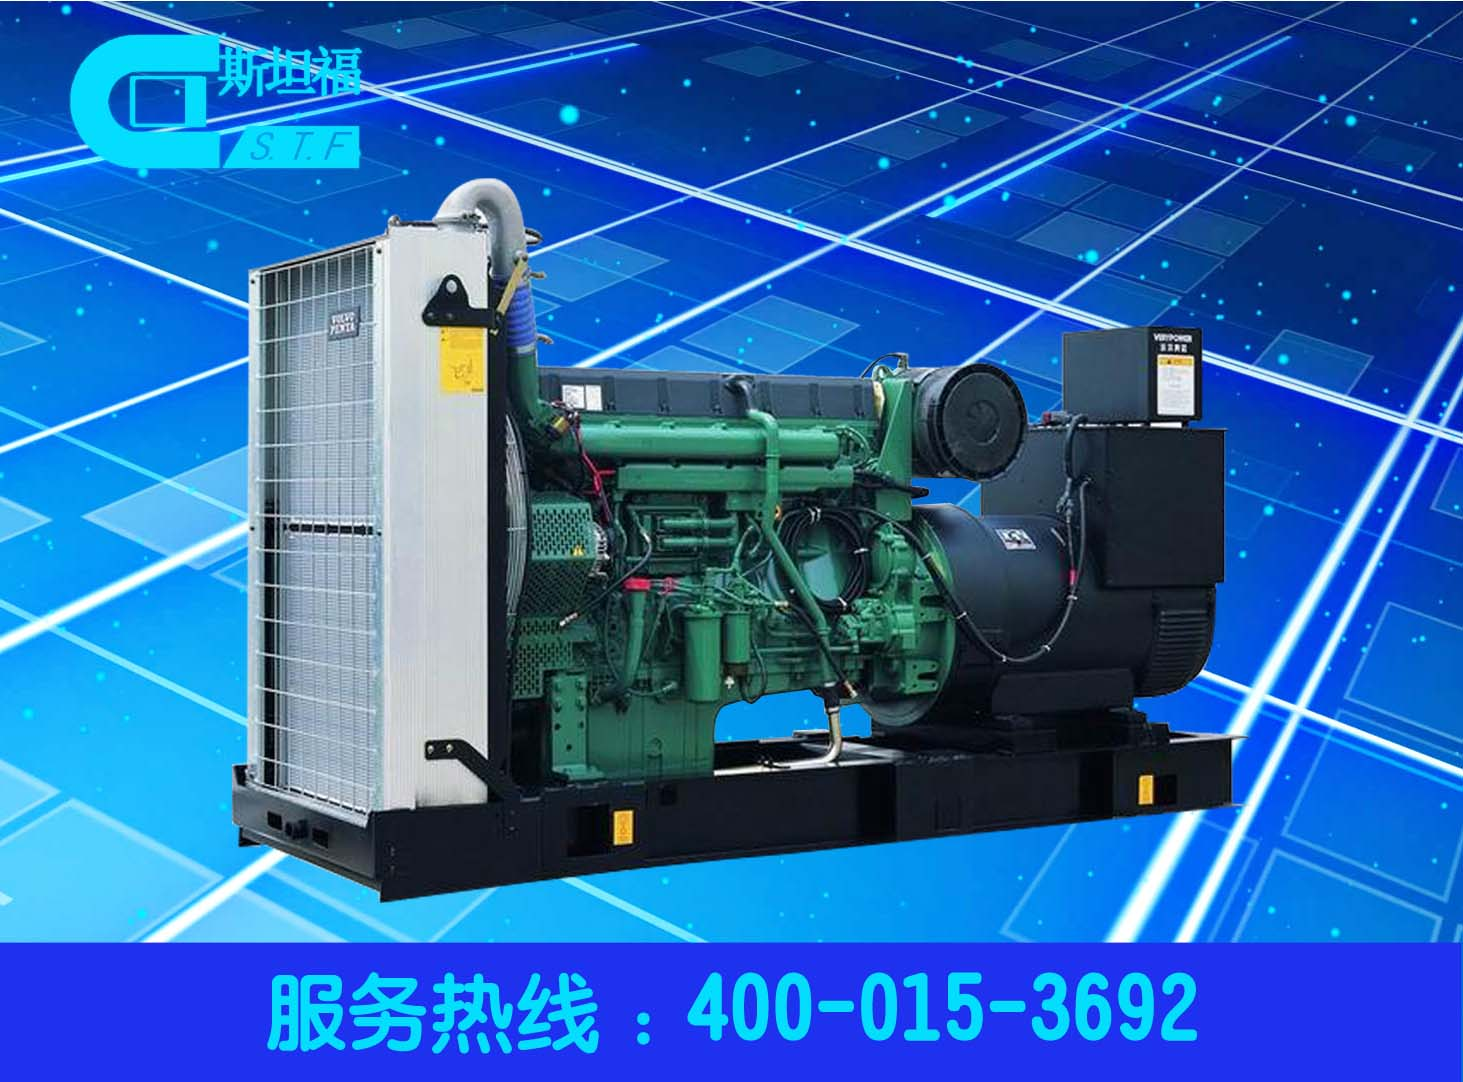 200KW柴油发电机组(卡得城仕) 电 机 组 机组型号 SSC200S 机组常用功率(KW) 200 电流(A) 360 电压(V) 400/230 功率因素 0.8 转速(r/min) 1500 频率(Hz) 50 机组尺寸(mm) 26509801450 机组重量(kg) 2350 柴 油 机 发动机产地 上海卡得城仕发动机 型号 KD12H227 发动机功率(KW) 227 缸数 6 缸径(mm)行程(mm) 135150 排气量(L) 12.